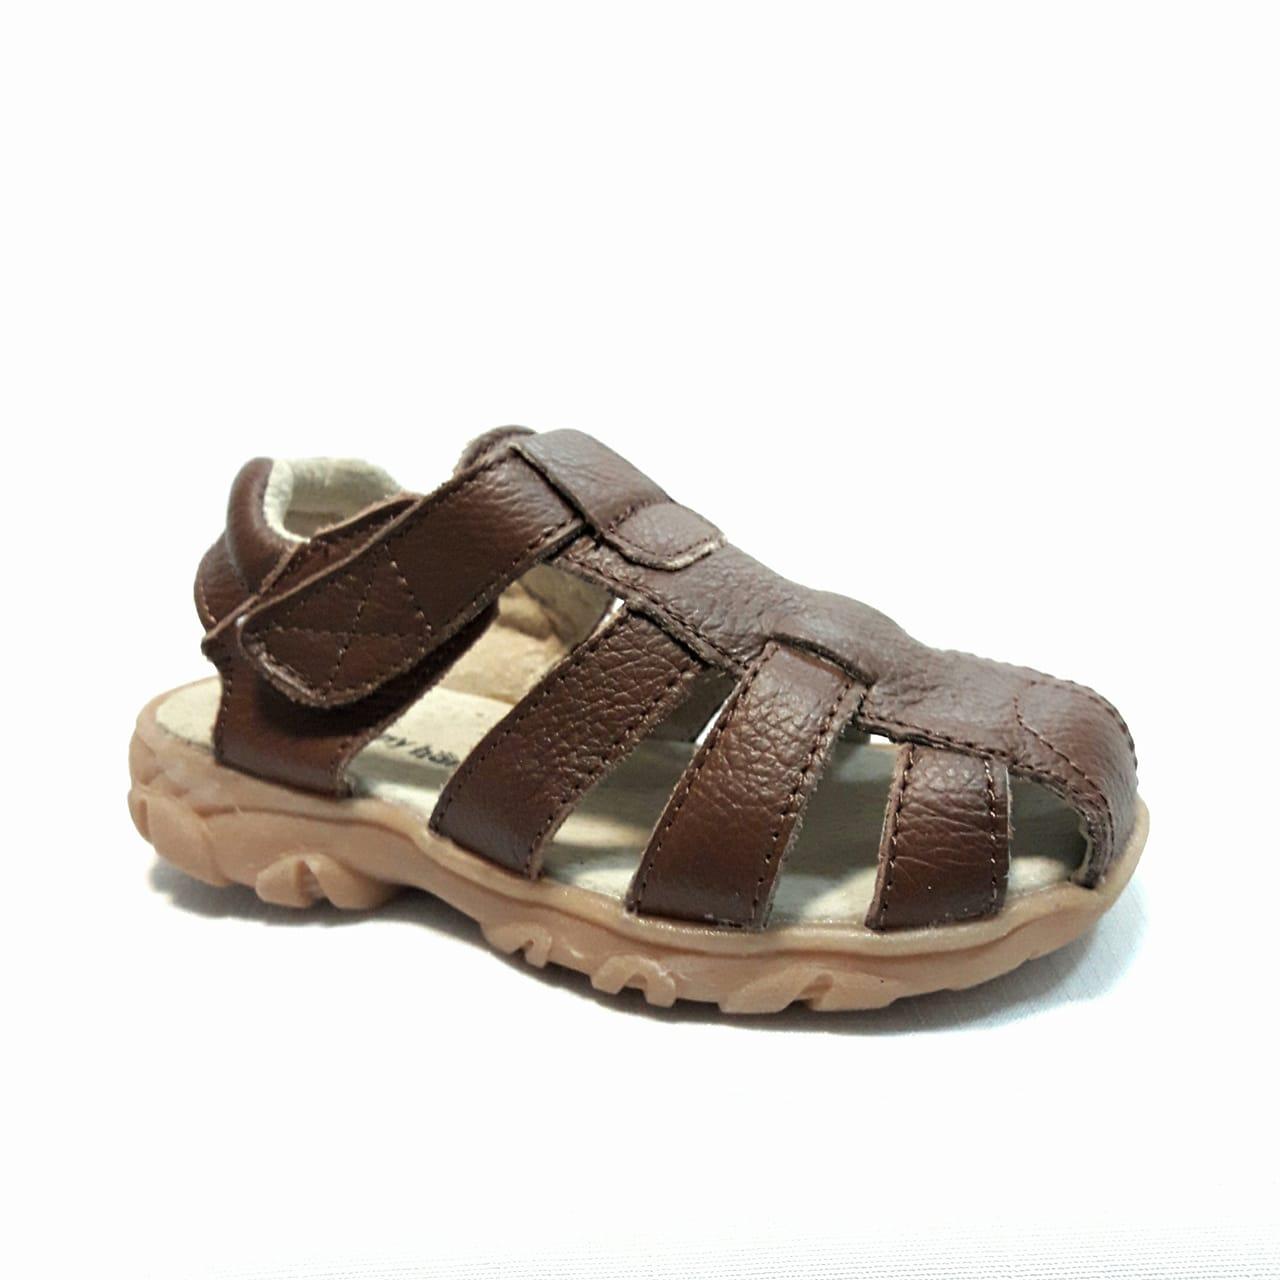 снимка на Кафяви бебешки кожени сандали.